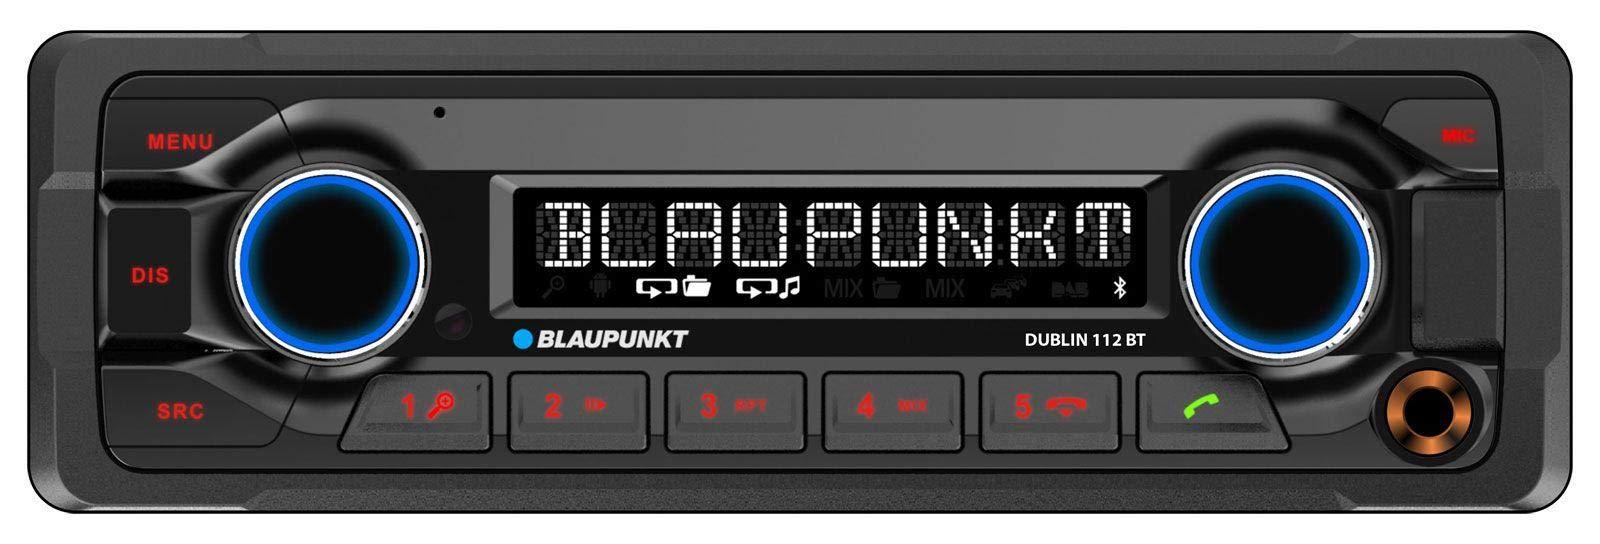 BLAUPUNKT-Dublin-112-BT-MP3-Autoradio-mit-BluetoothUSBAUX-IN